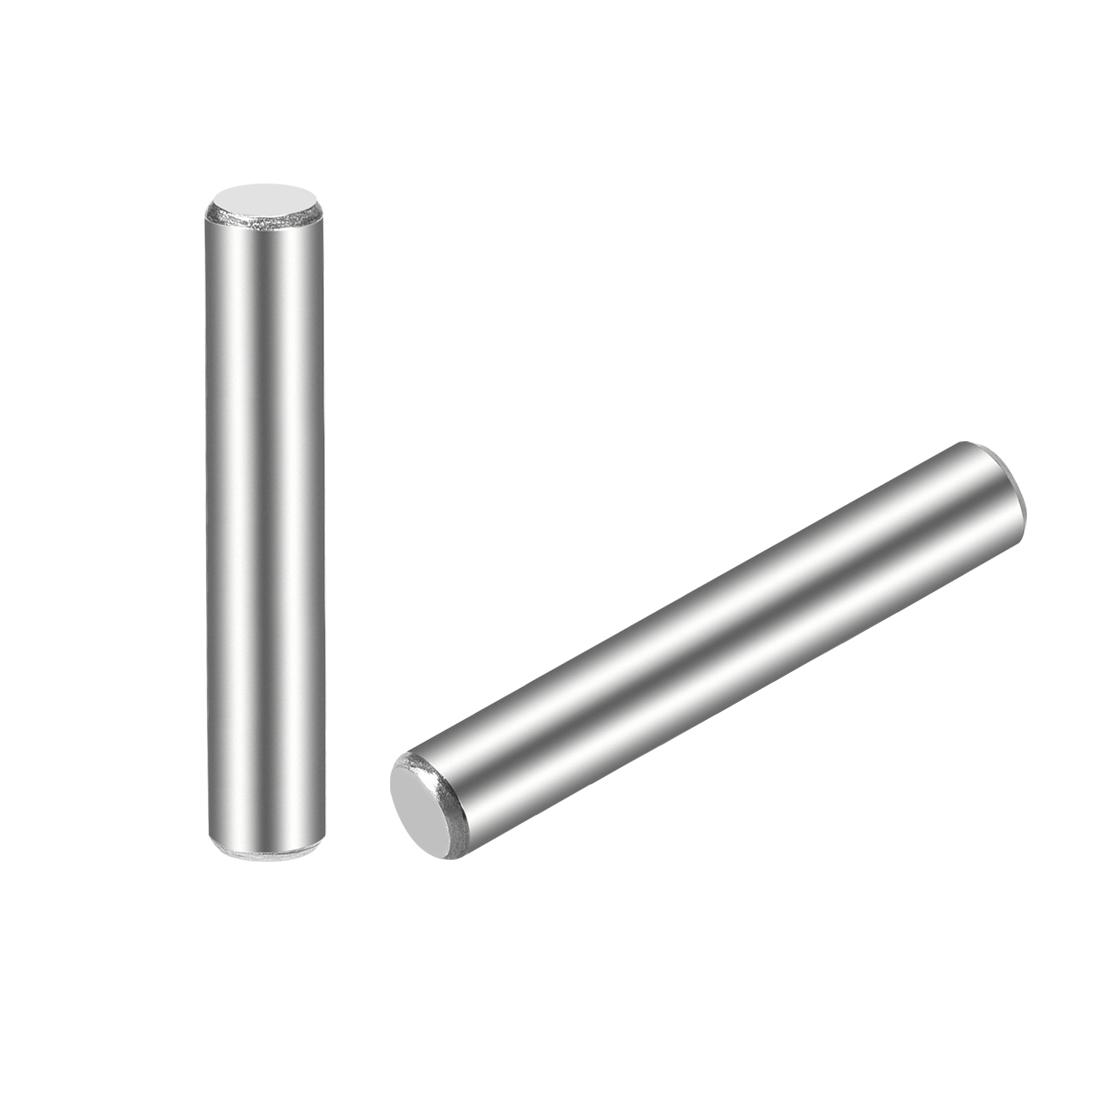 15Pcs 5mm x 40mm Dowel Pin 304 Stainless Steel Shelf Support Pin Fasten